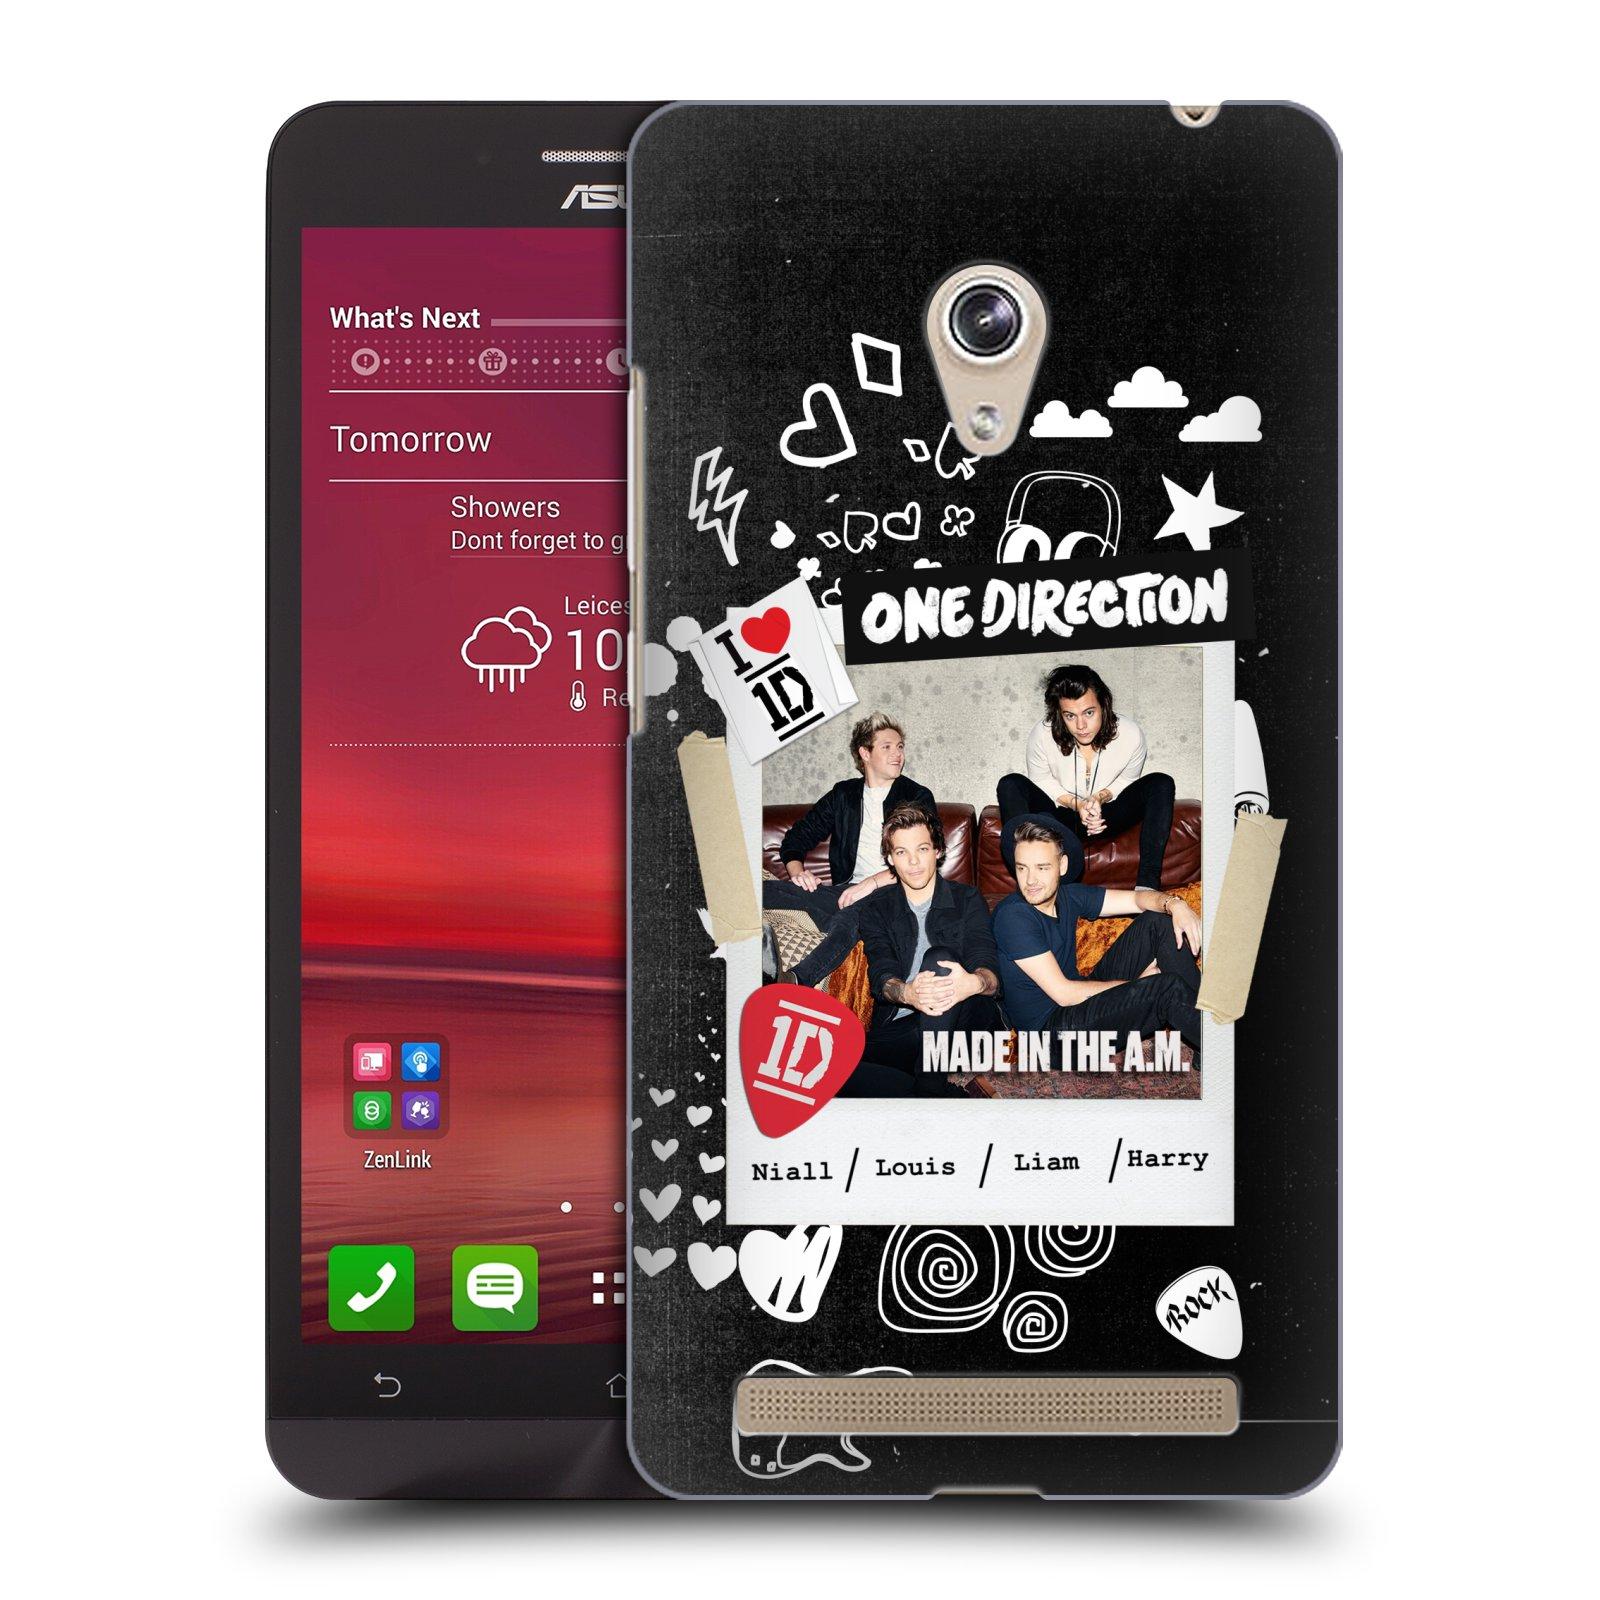 Plastové pouzdro na mobil Asus Zenfone 6 HEAD CASE One Direction - S kytárou (Kryt či obal One Direction Official na mobilní telefon Asus Zenfone 6 A600CG / A601CG)